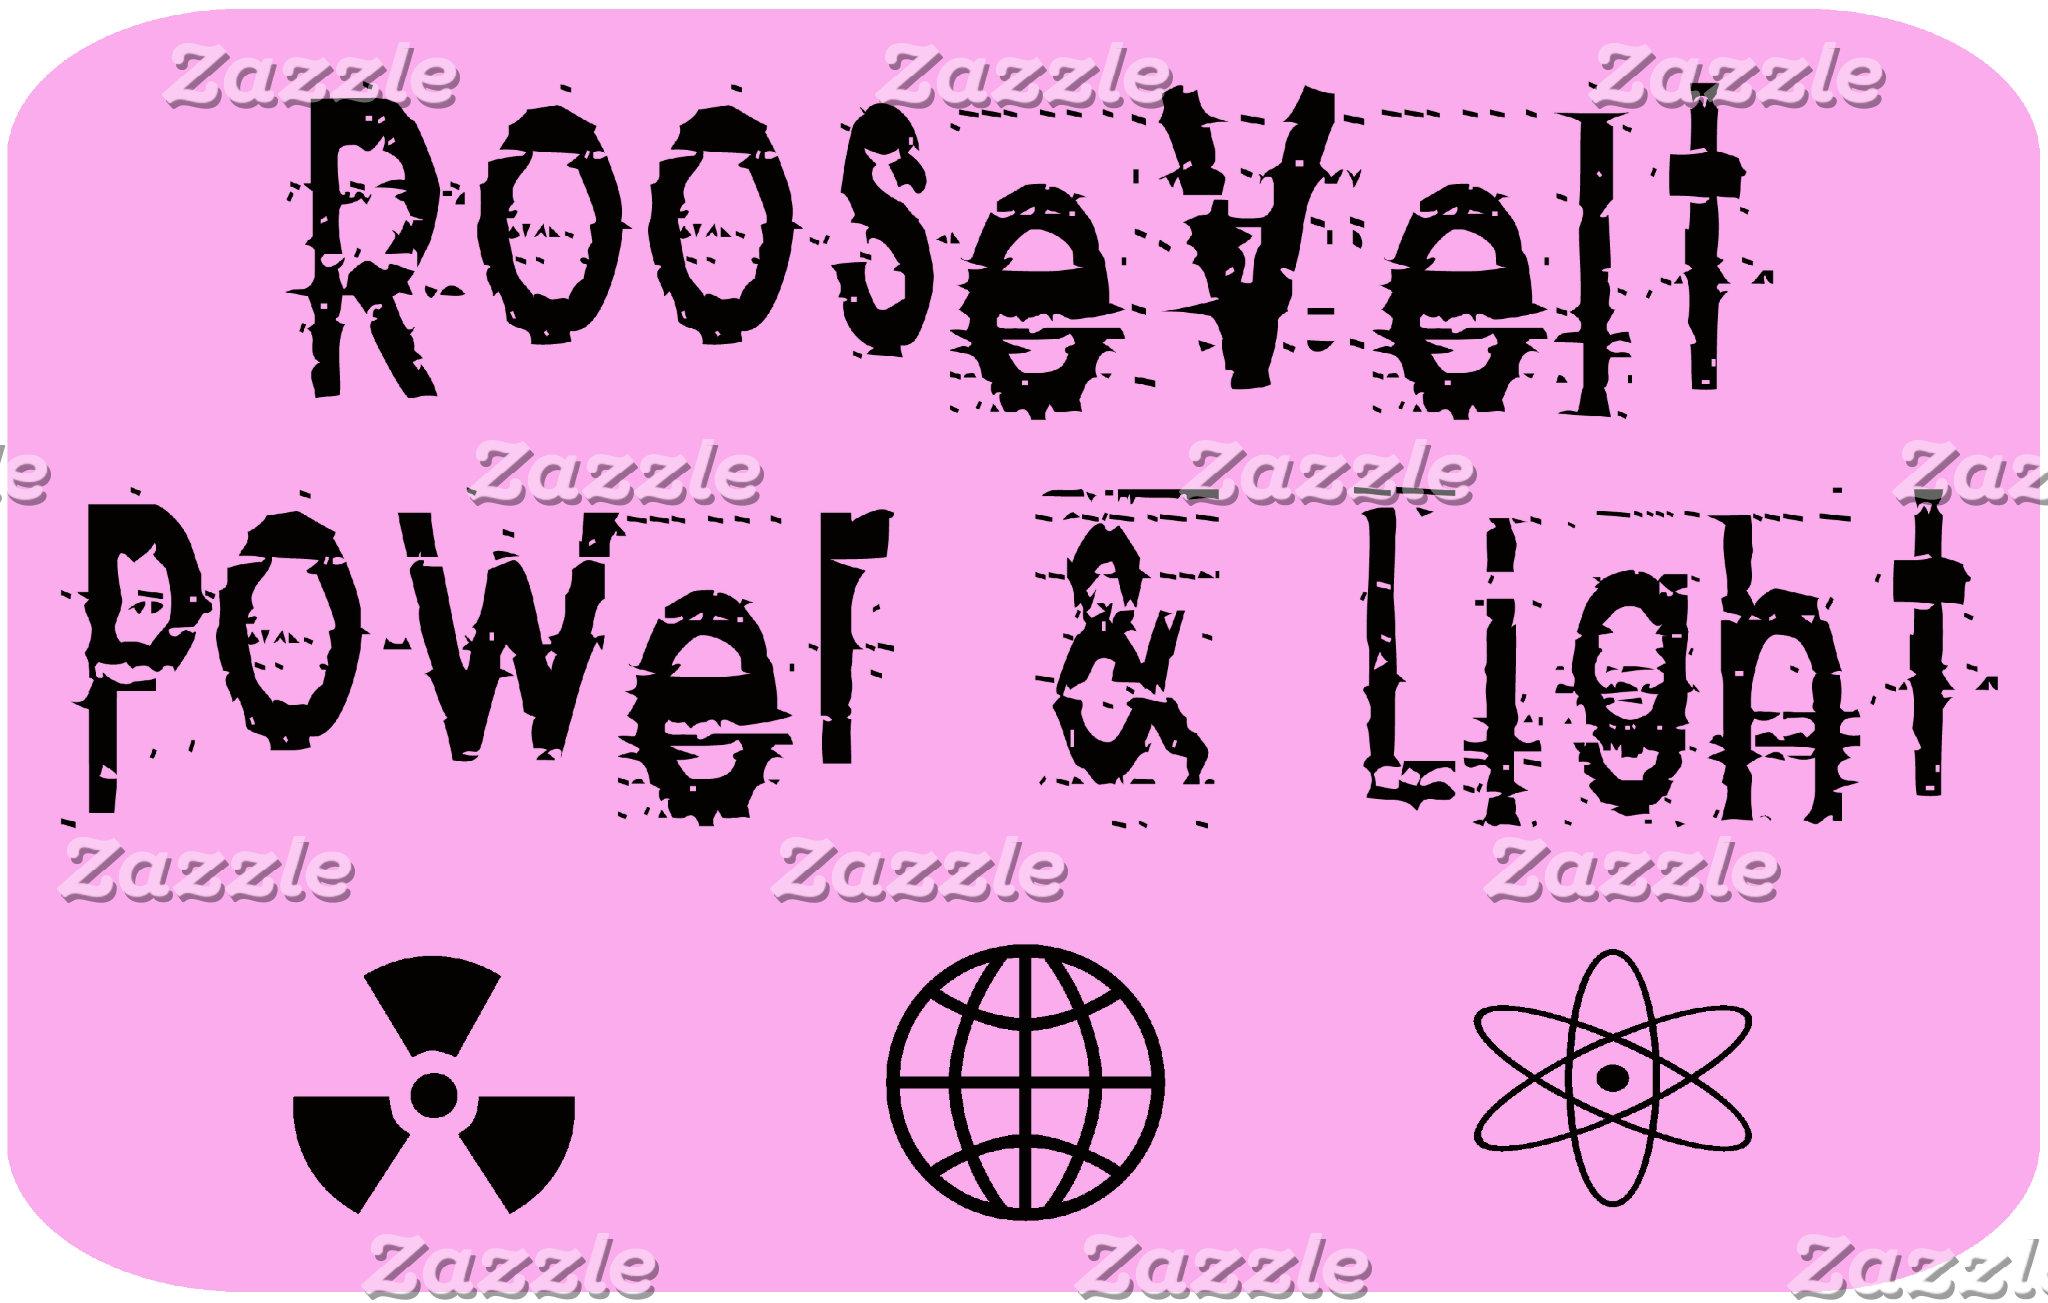 Roosevelt Power and Light